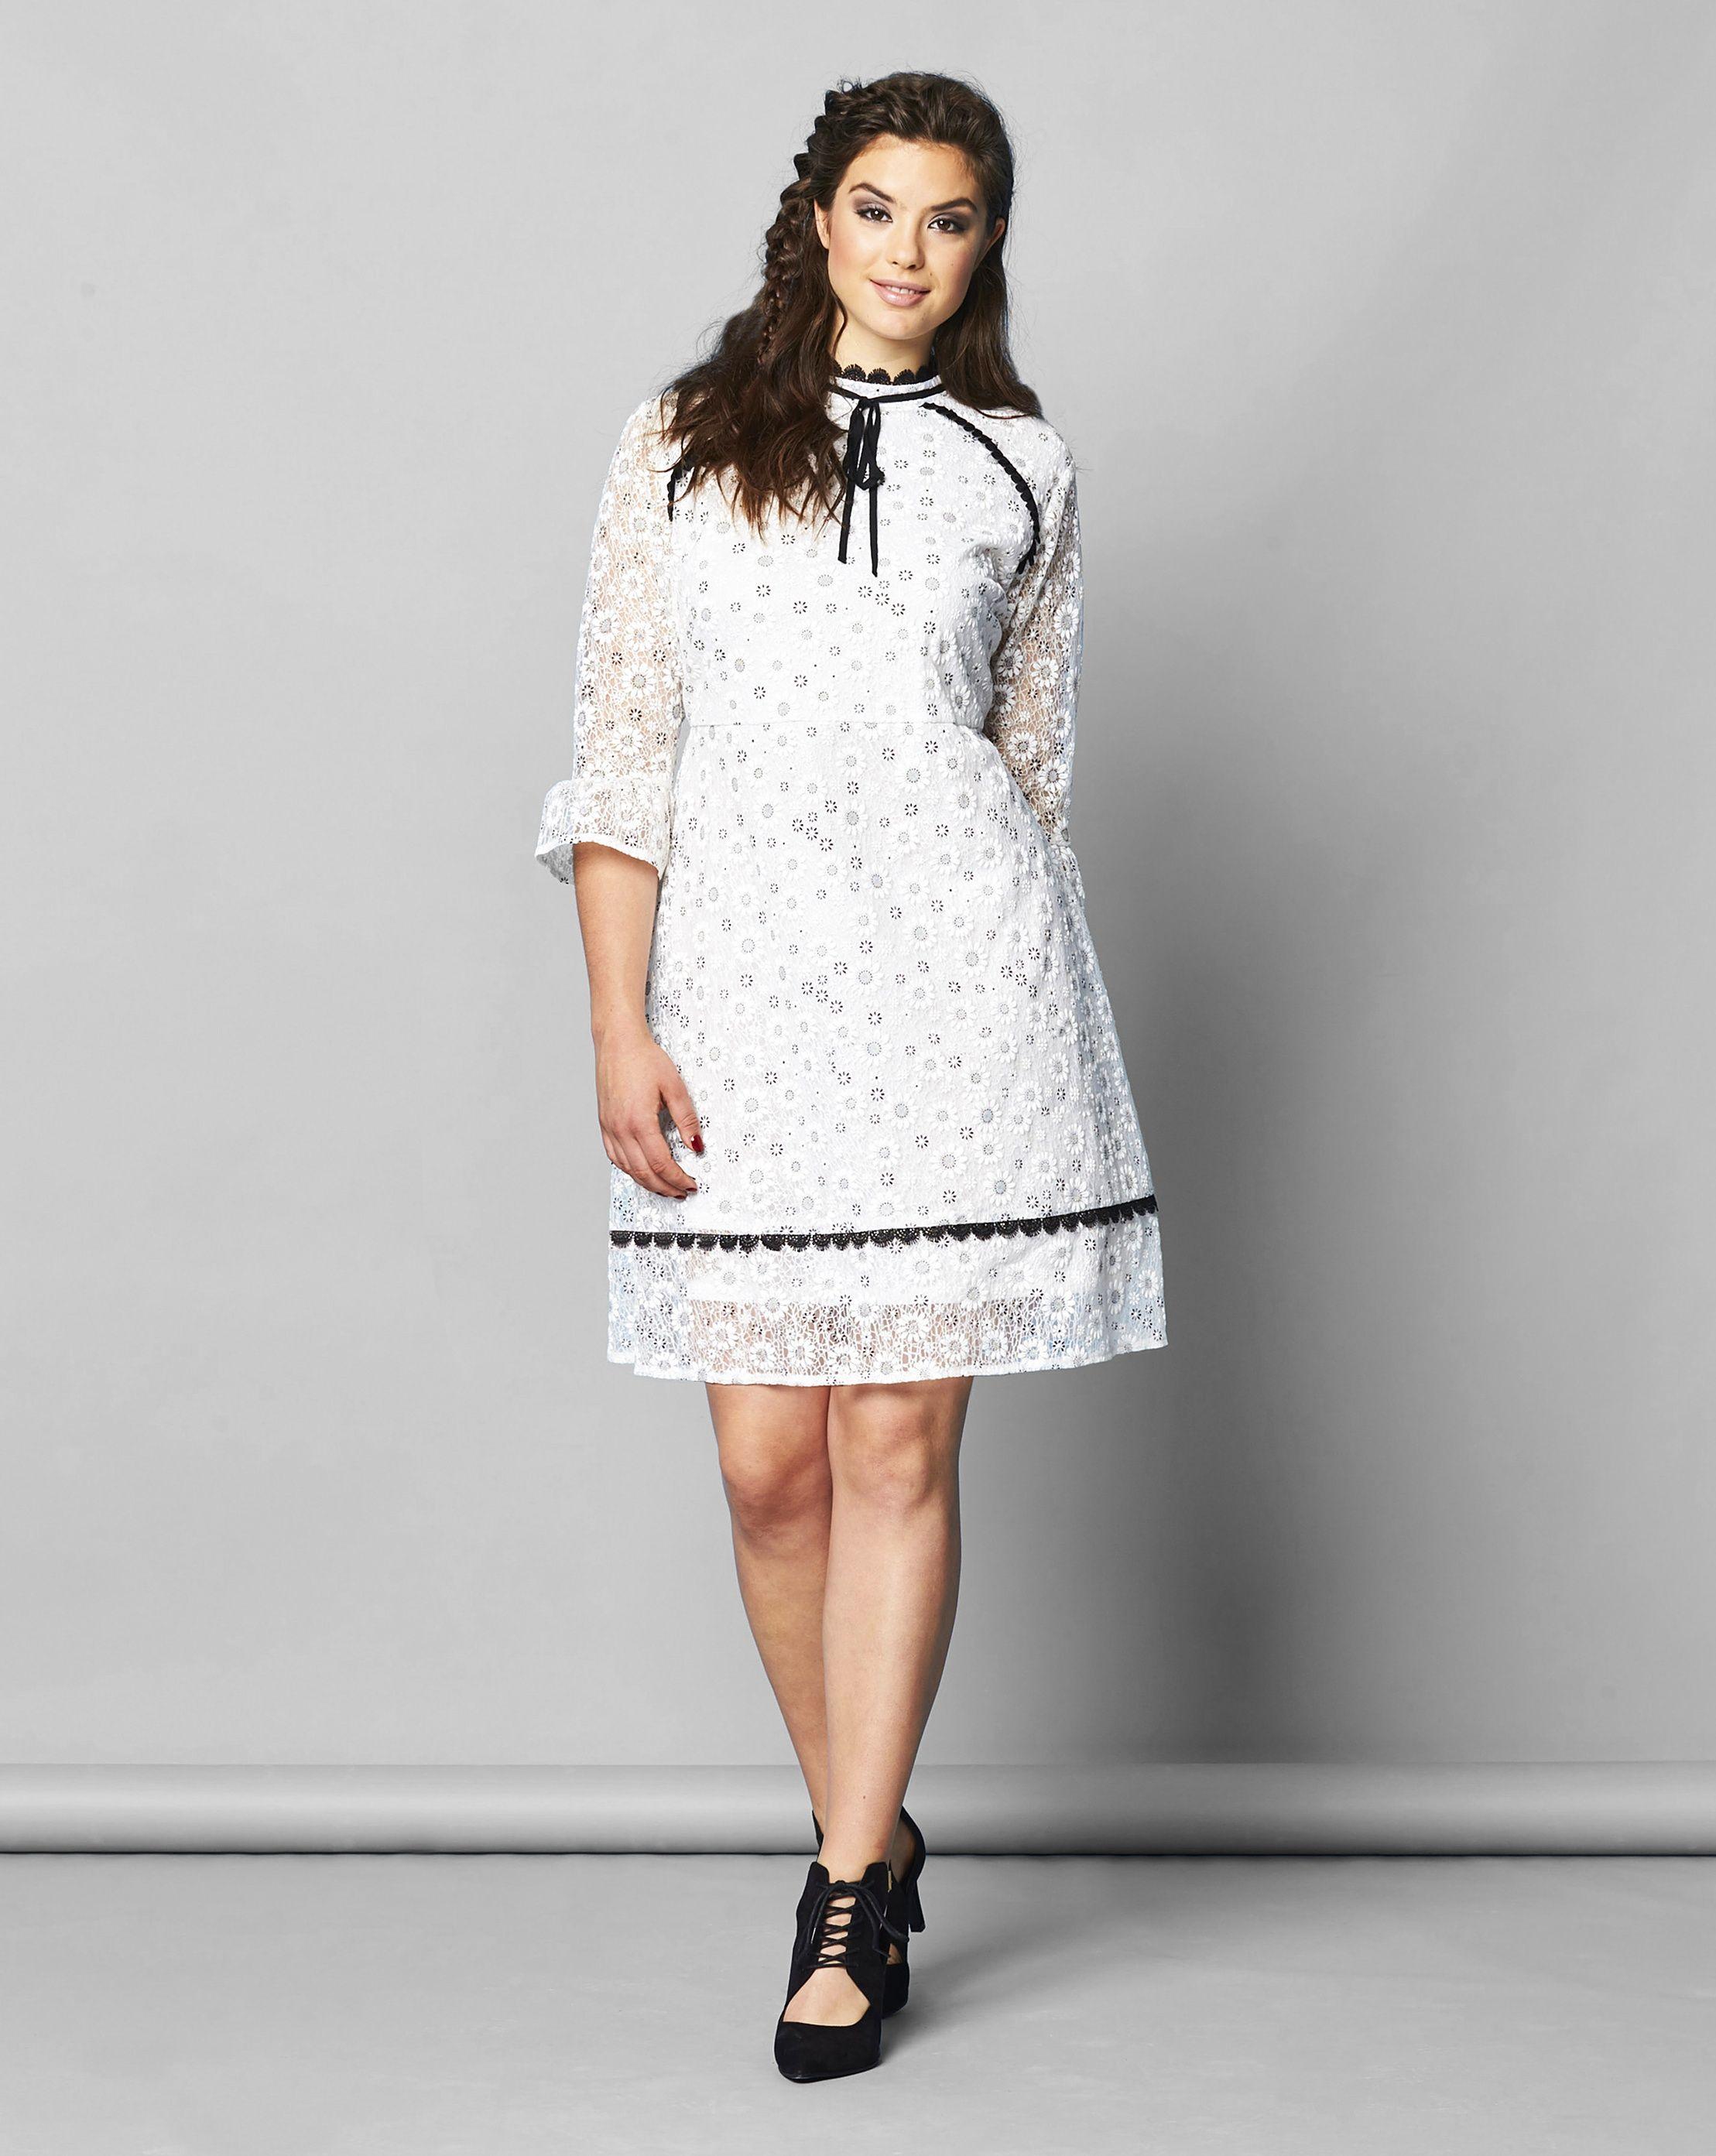 image0 New years eve dresses, Midi maxi dress, Dresses